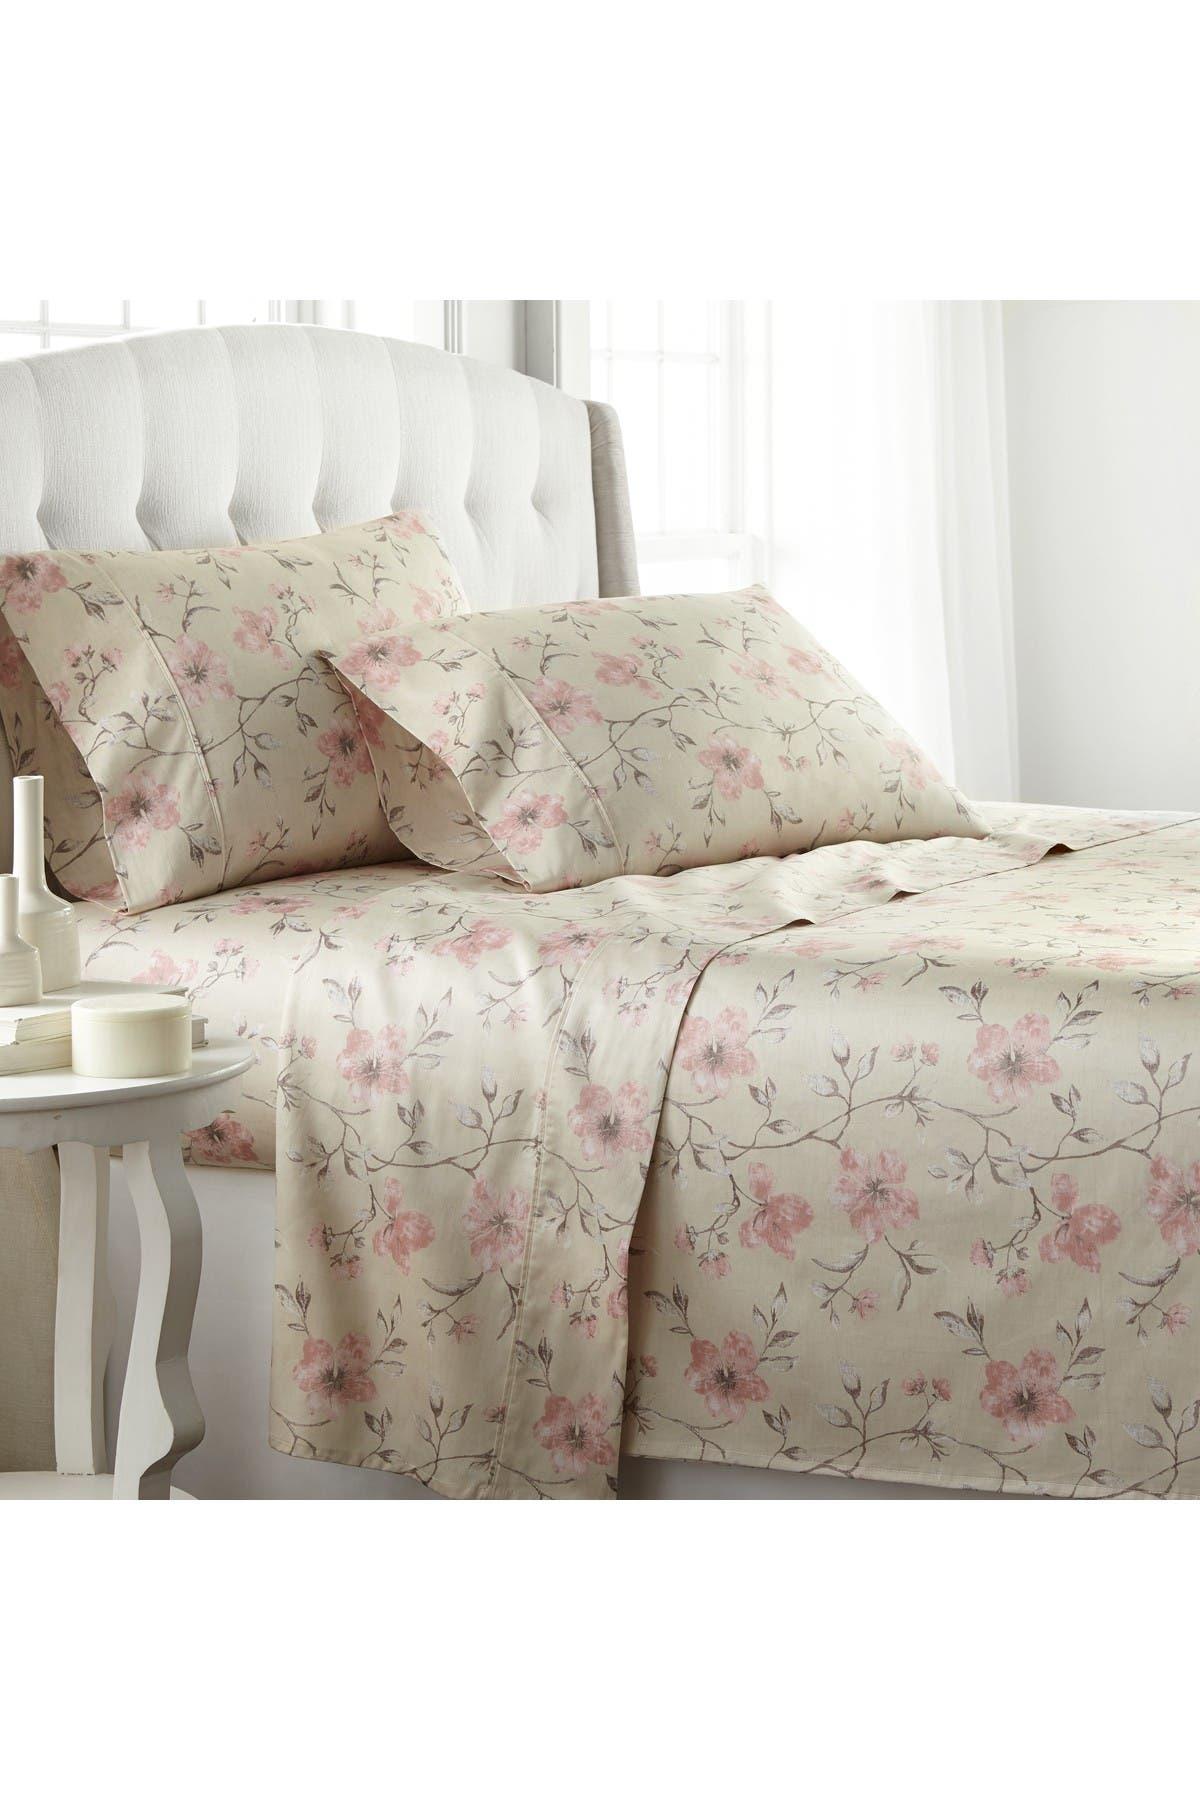 Image of SOUTHSHORE FINE LINENS King Extra Deep Pocket 300 Thread-Count Cotton Sheet Sets - Floral Soft Sand